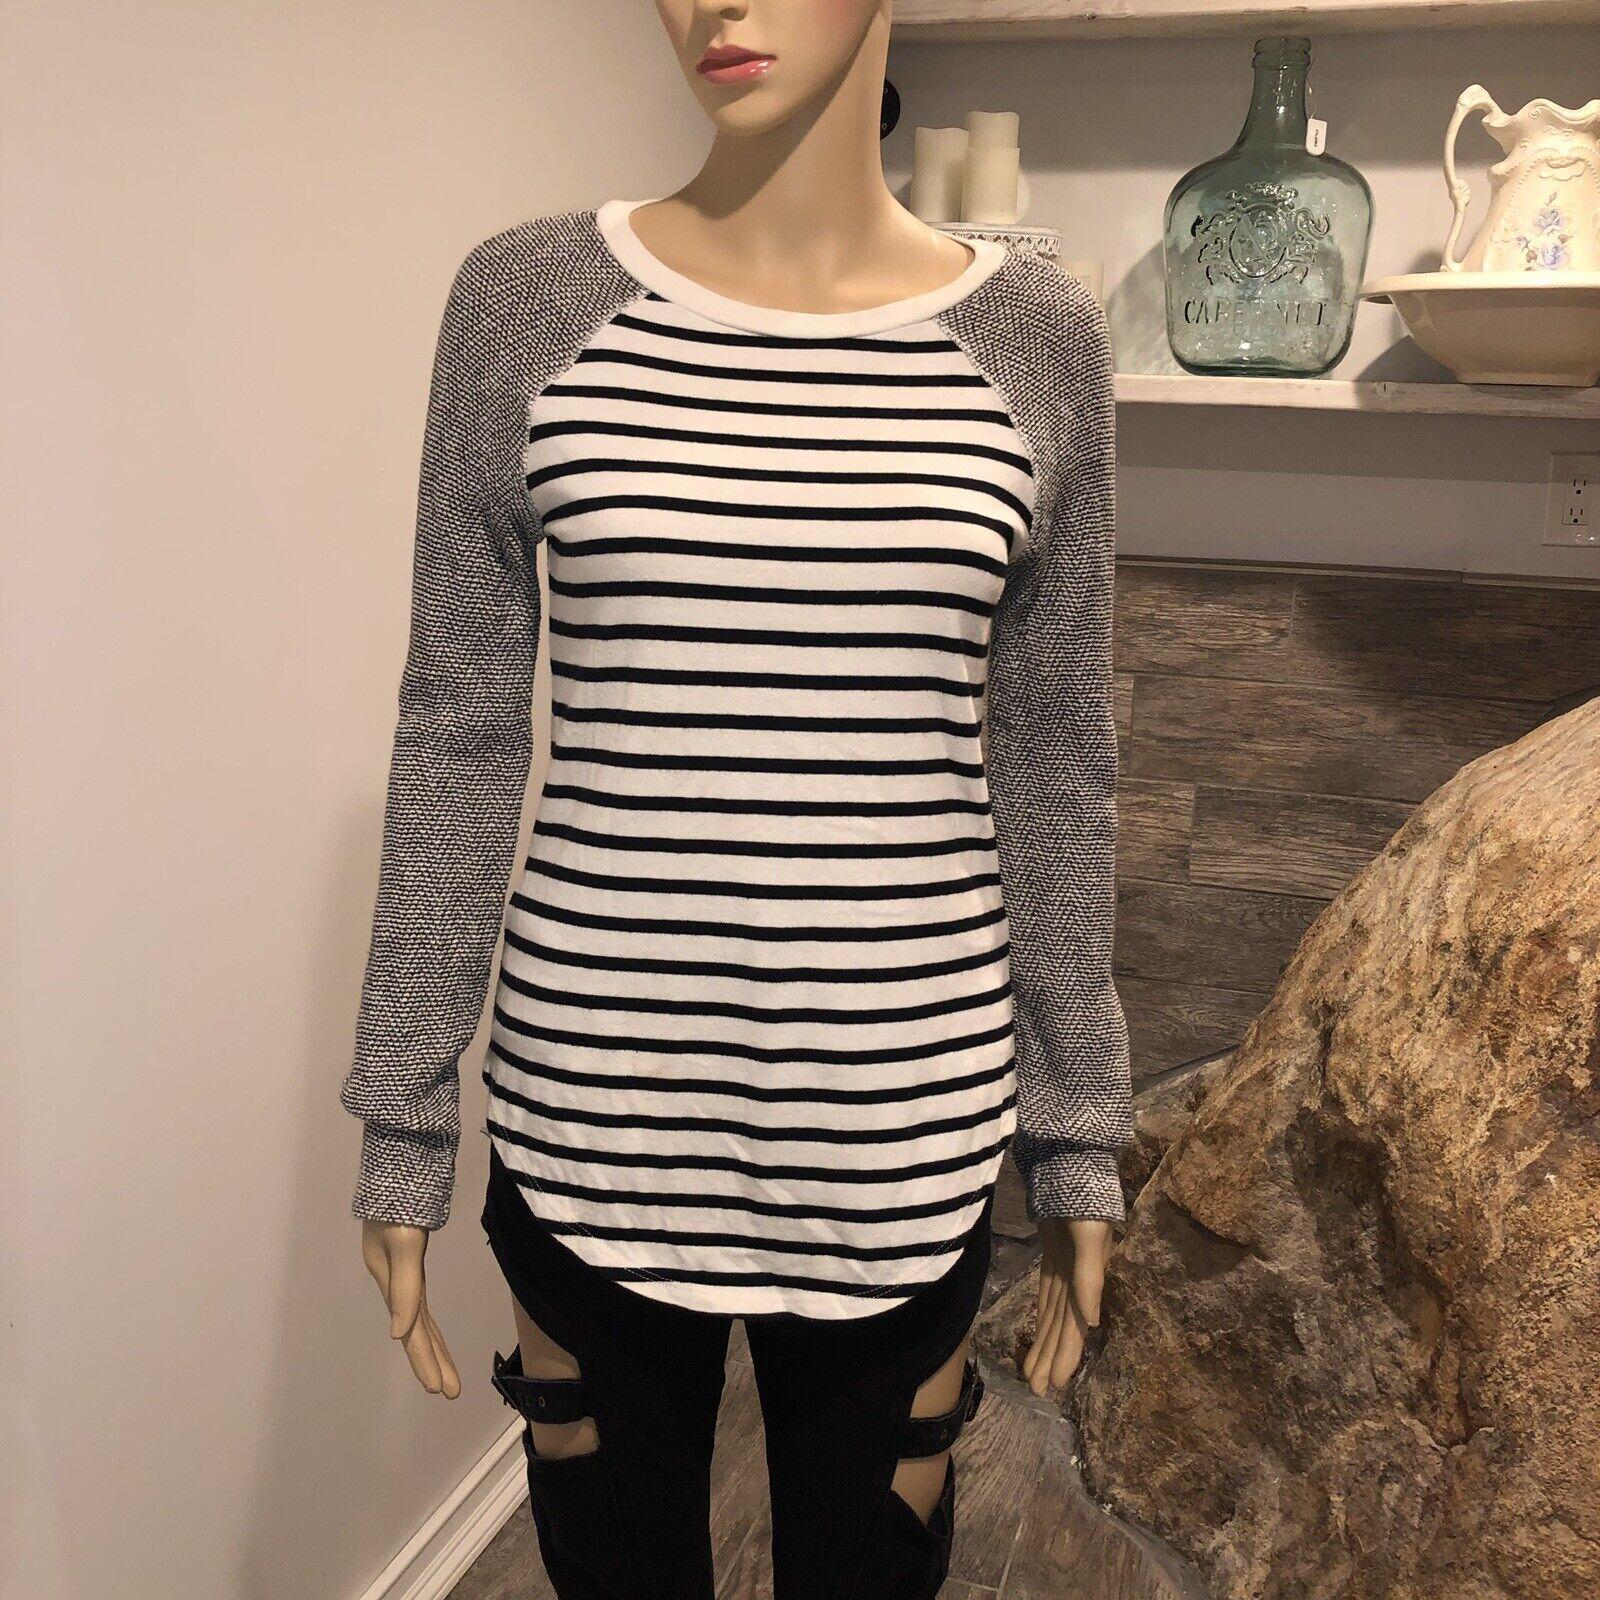 PJK COTTON striped sweater size small